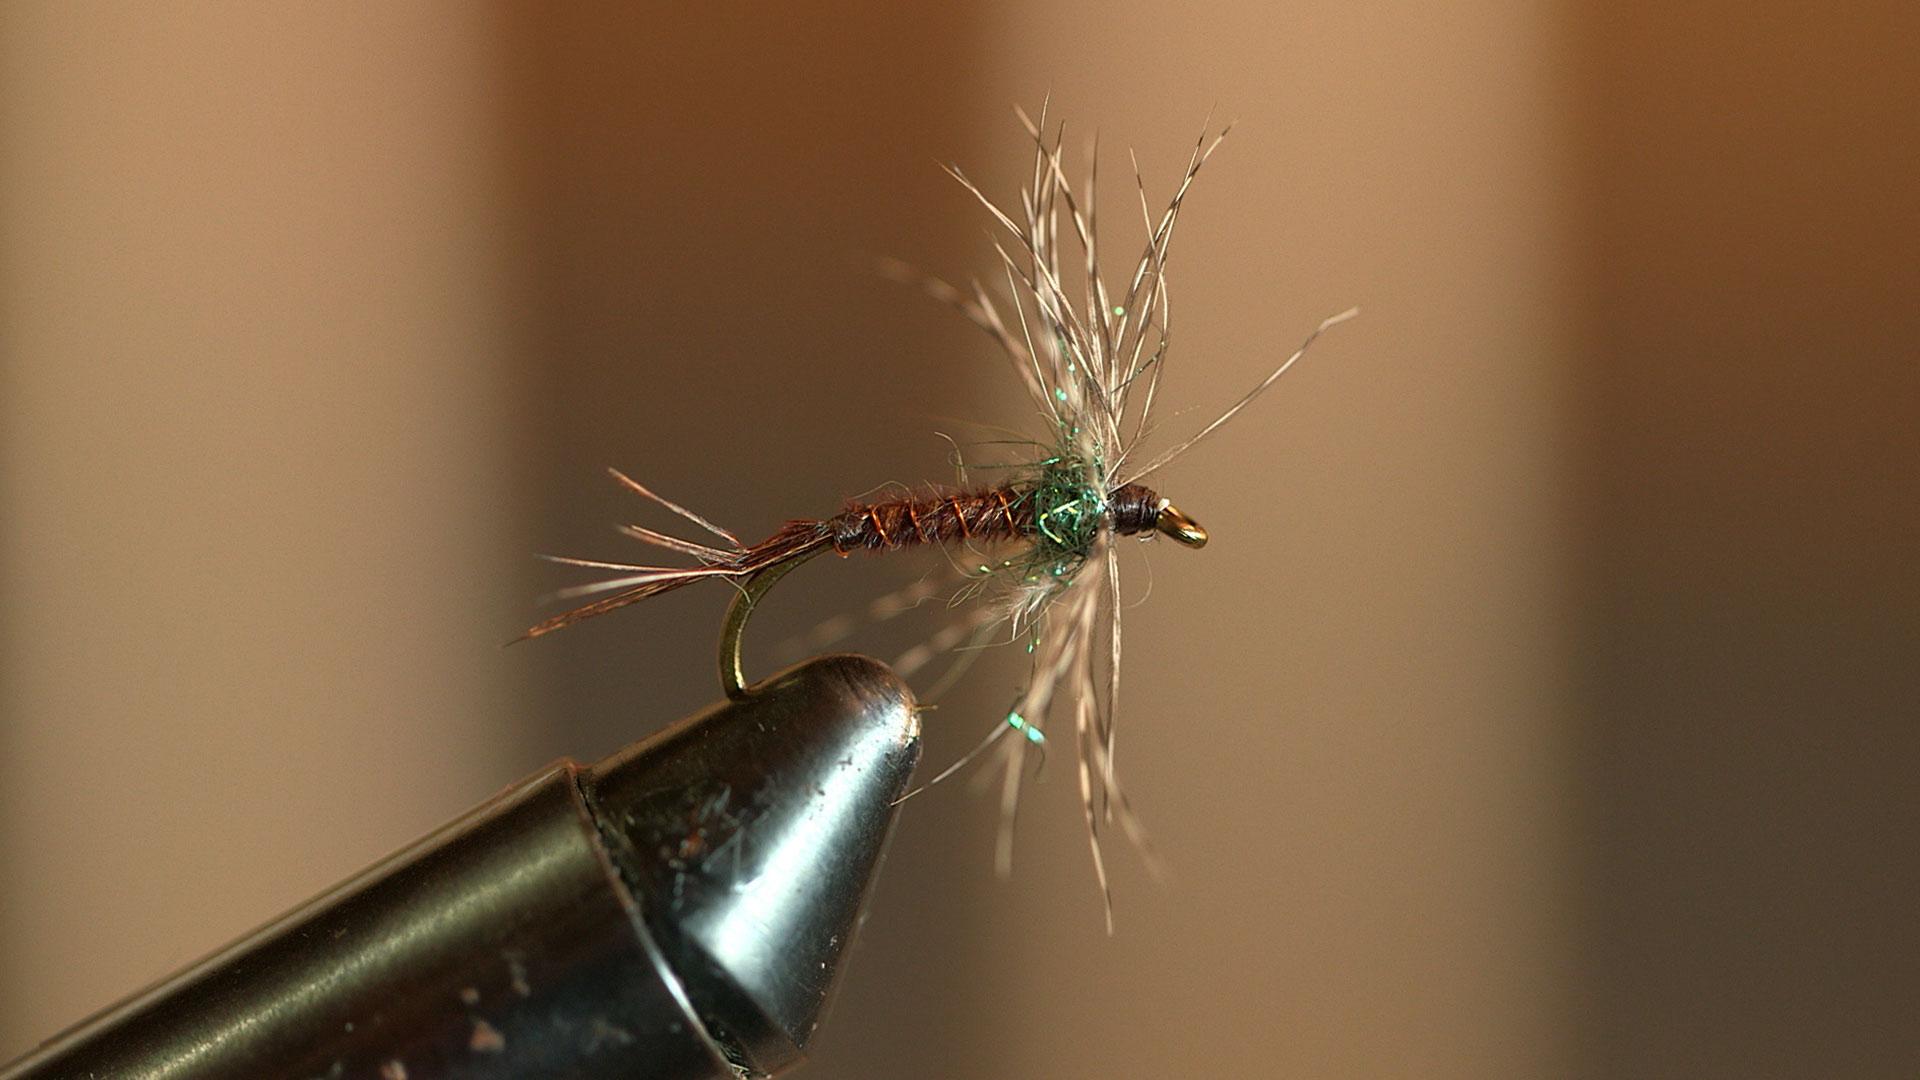 patagonia sports fly fishing